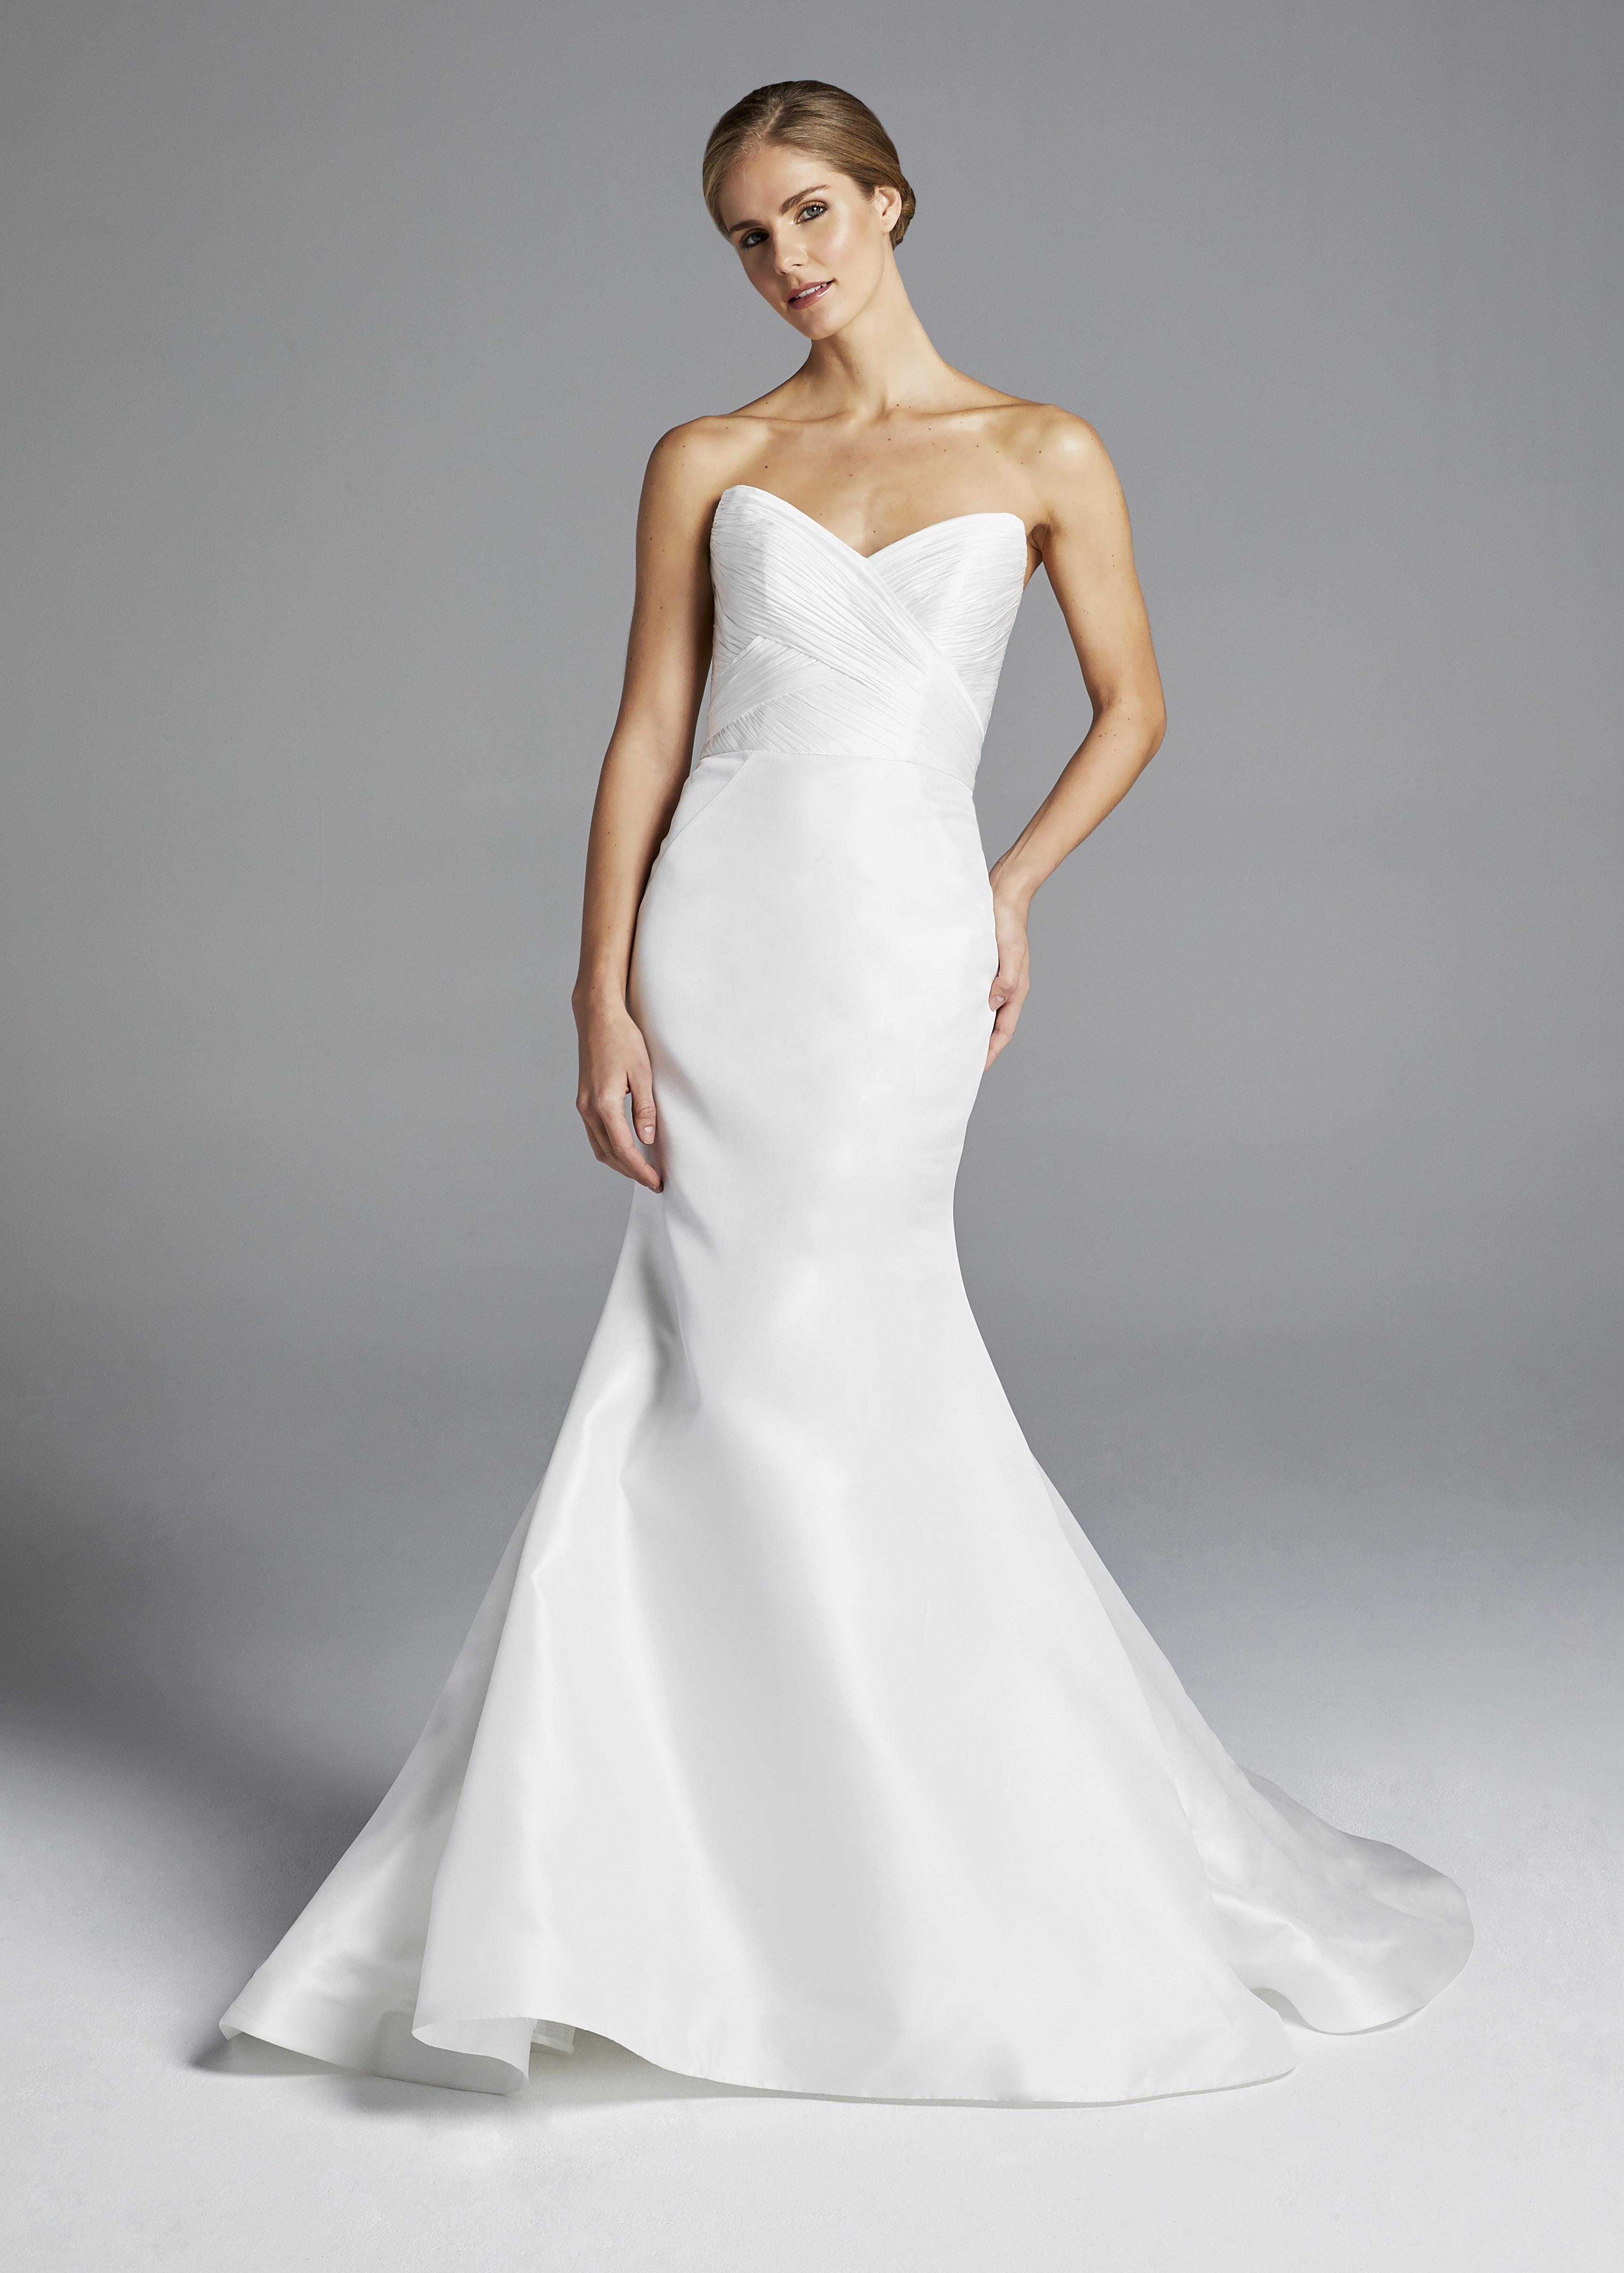 anne barge strapless mermaid wedding dress spring 2019